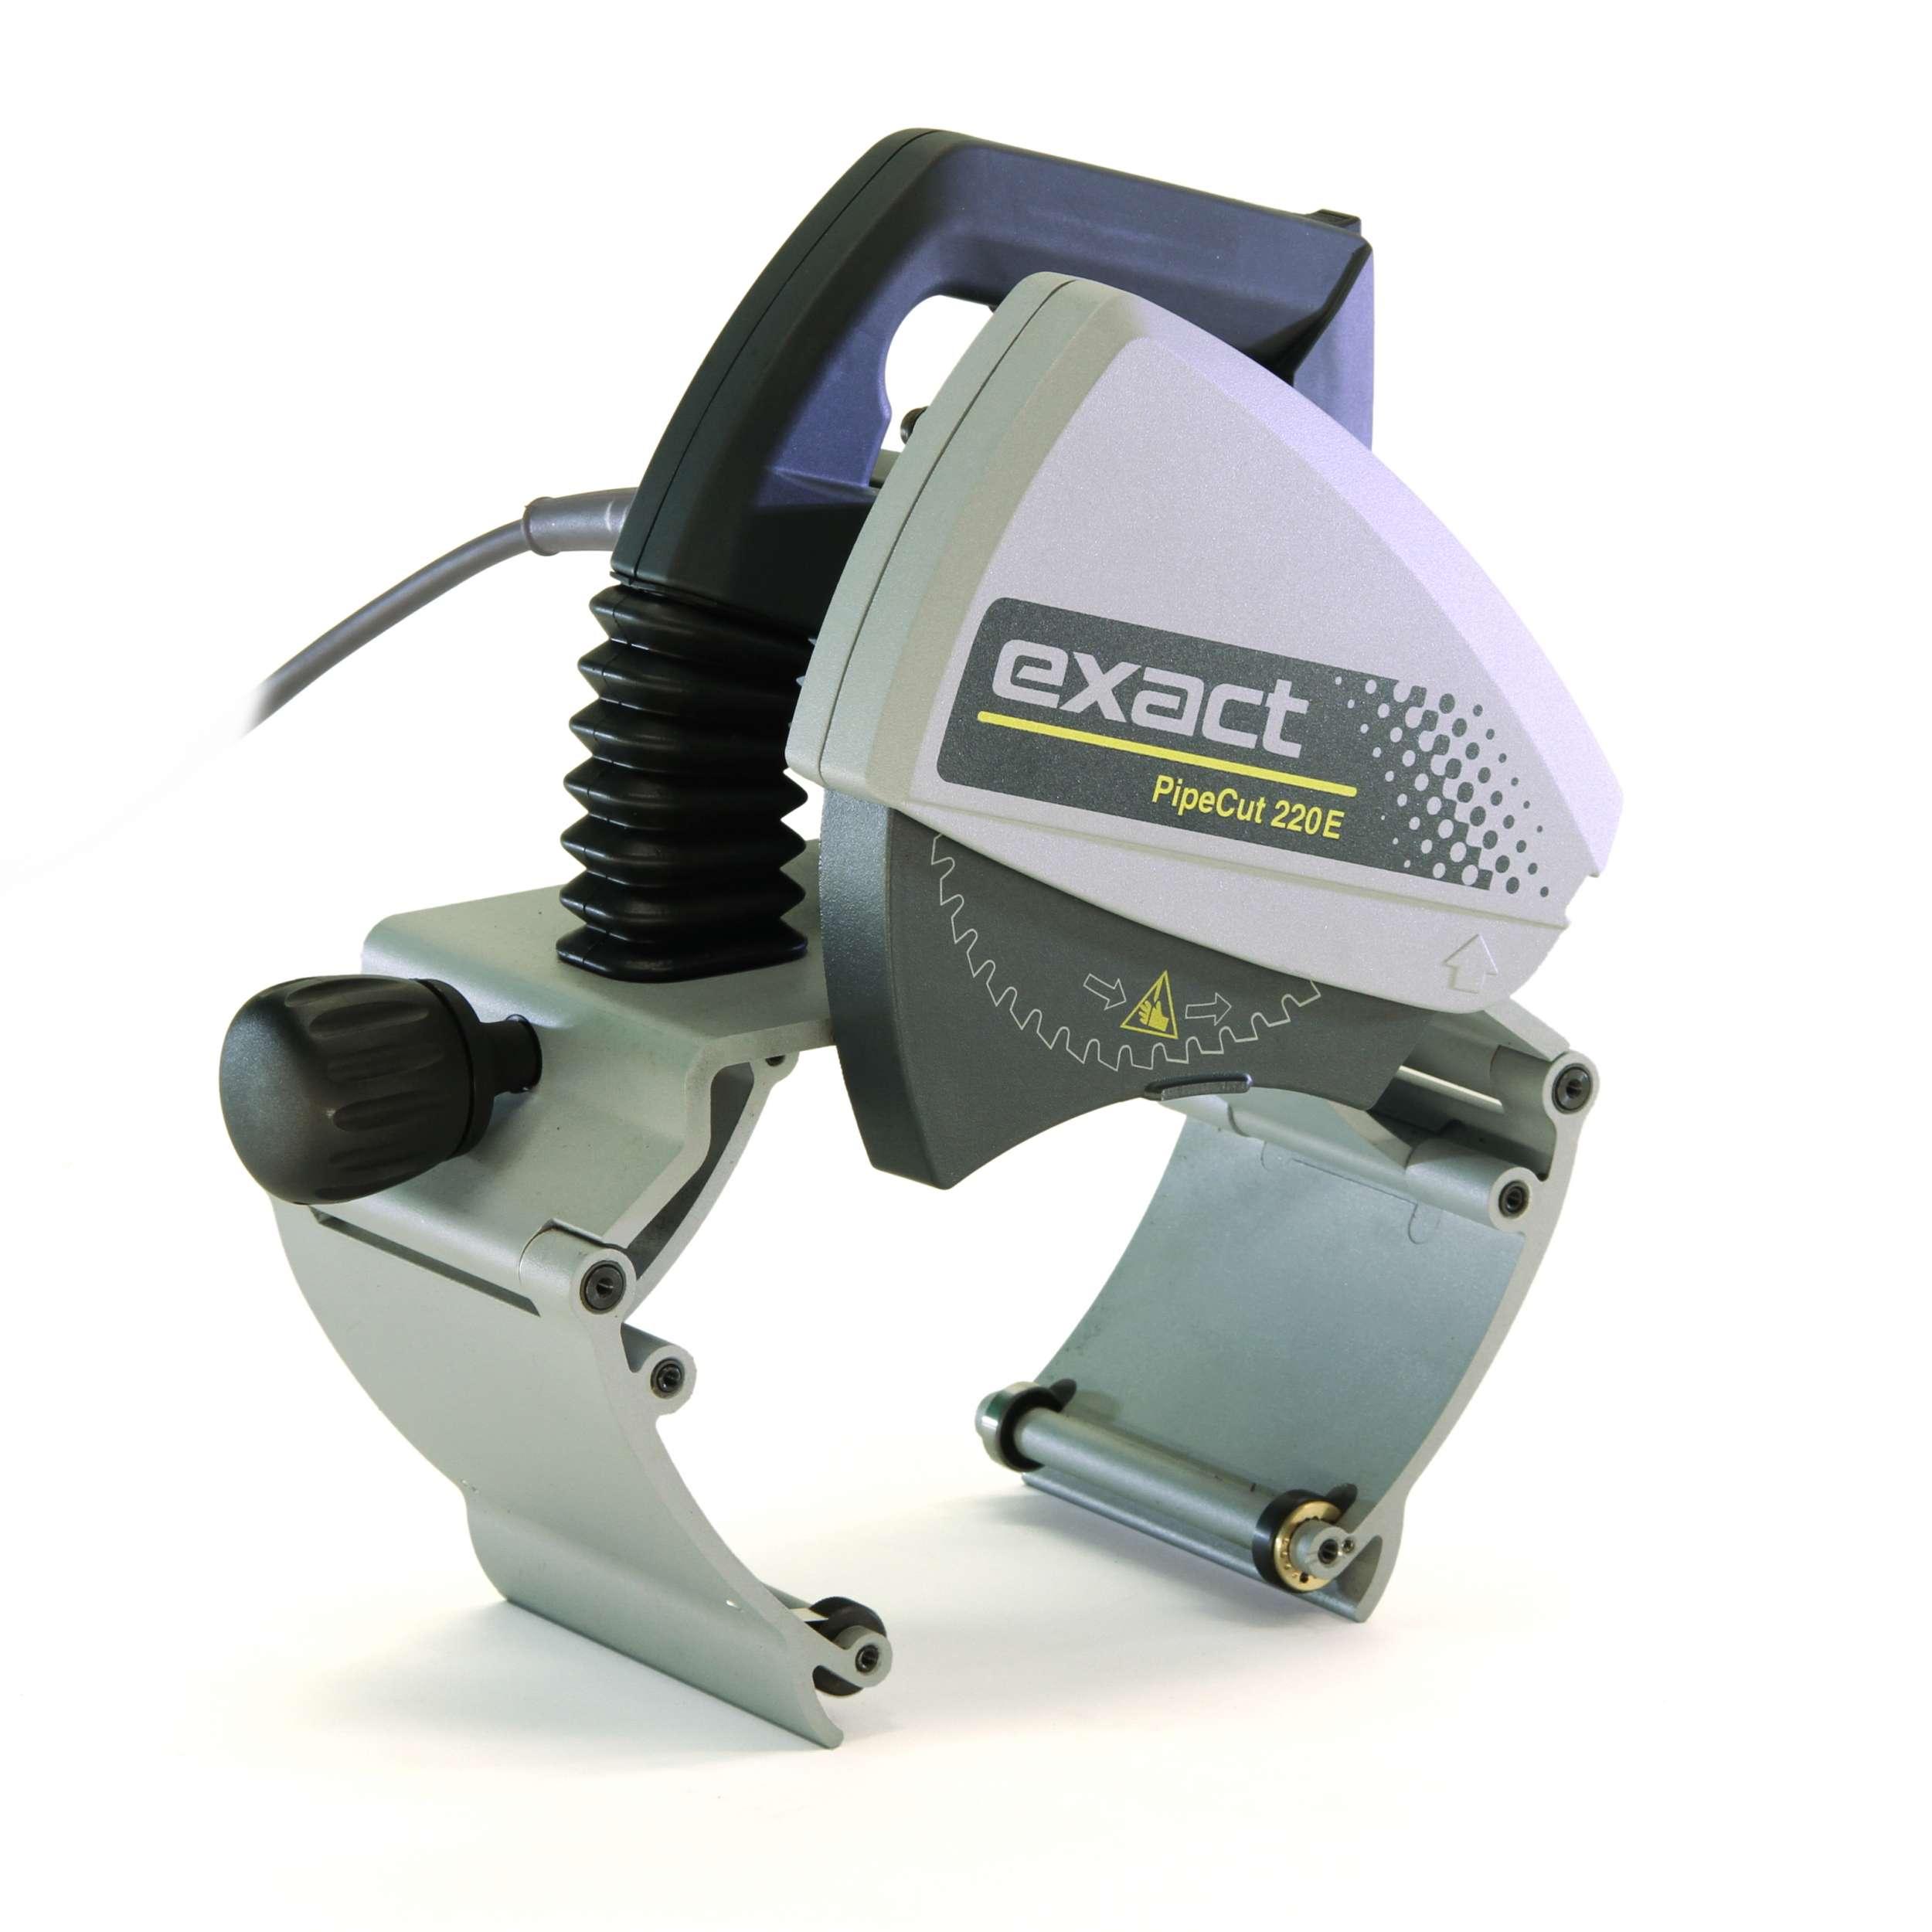 Exact PipeCut 220E Boru kesme sistemi